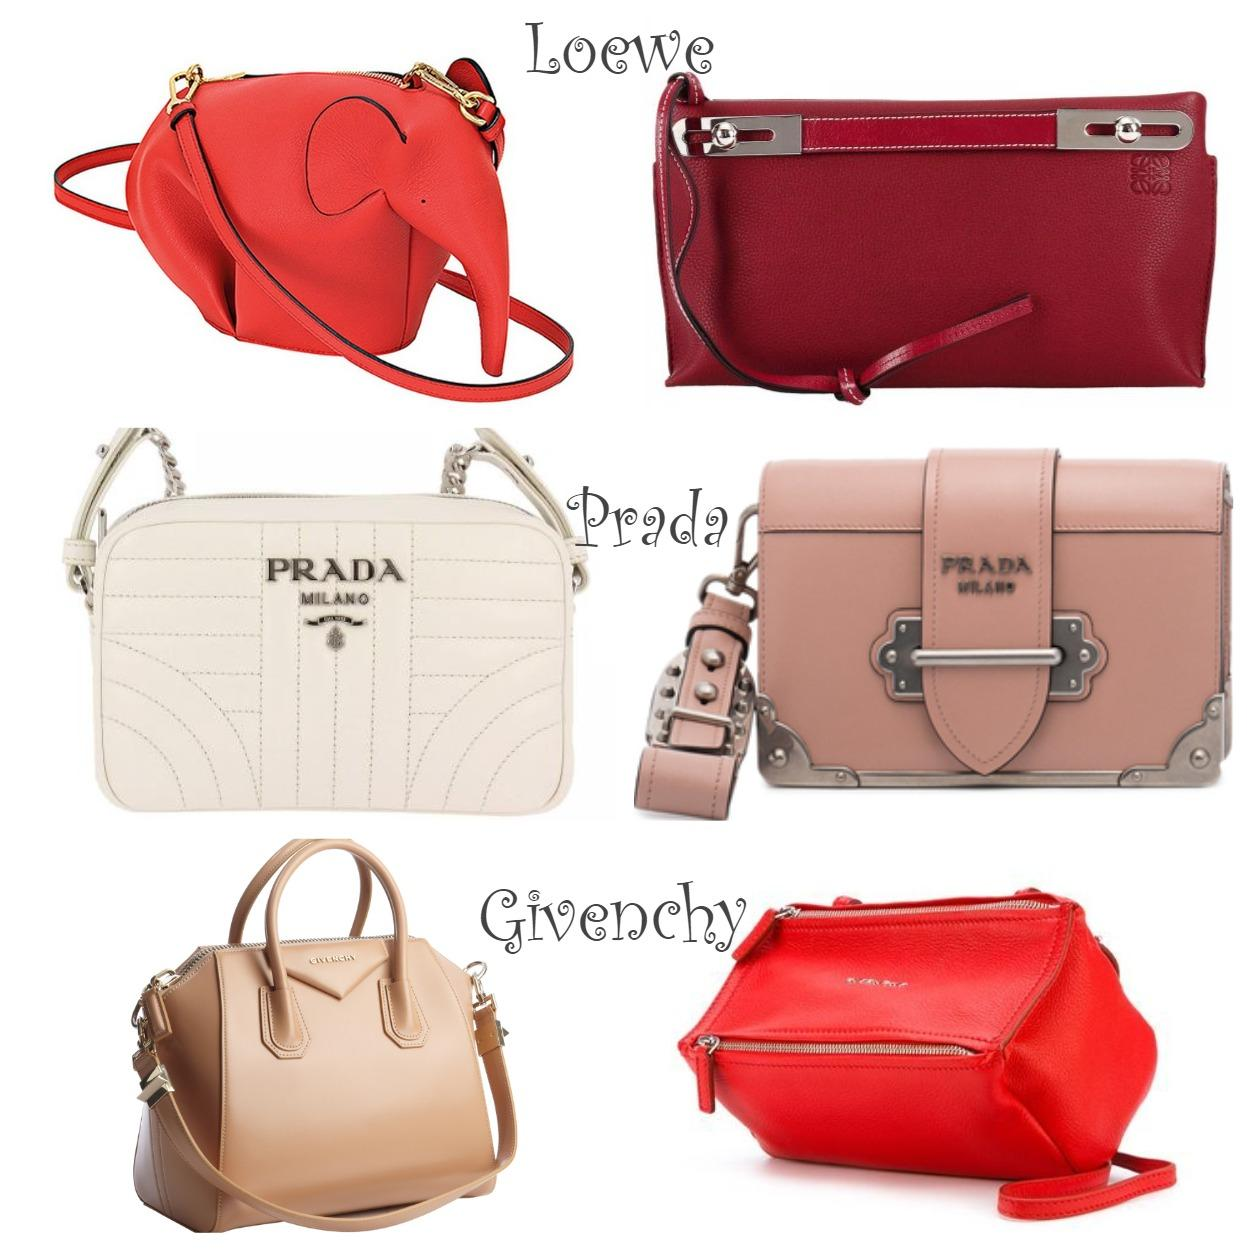 Модные мини-сумочки Loewe, Prada, Givenchy